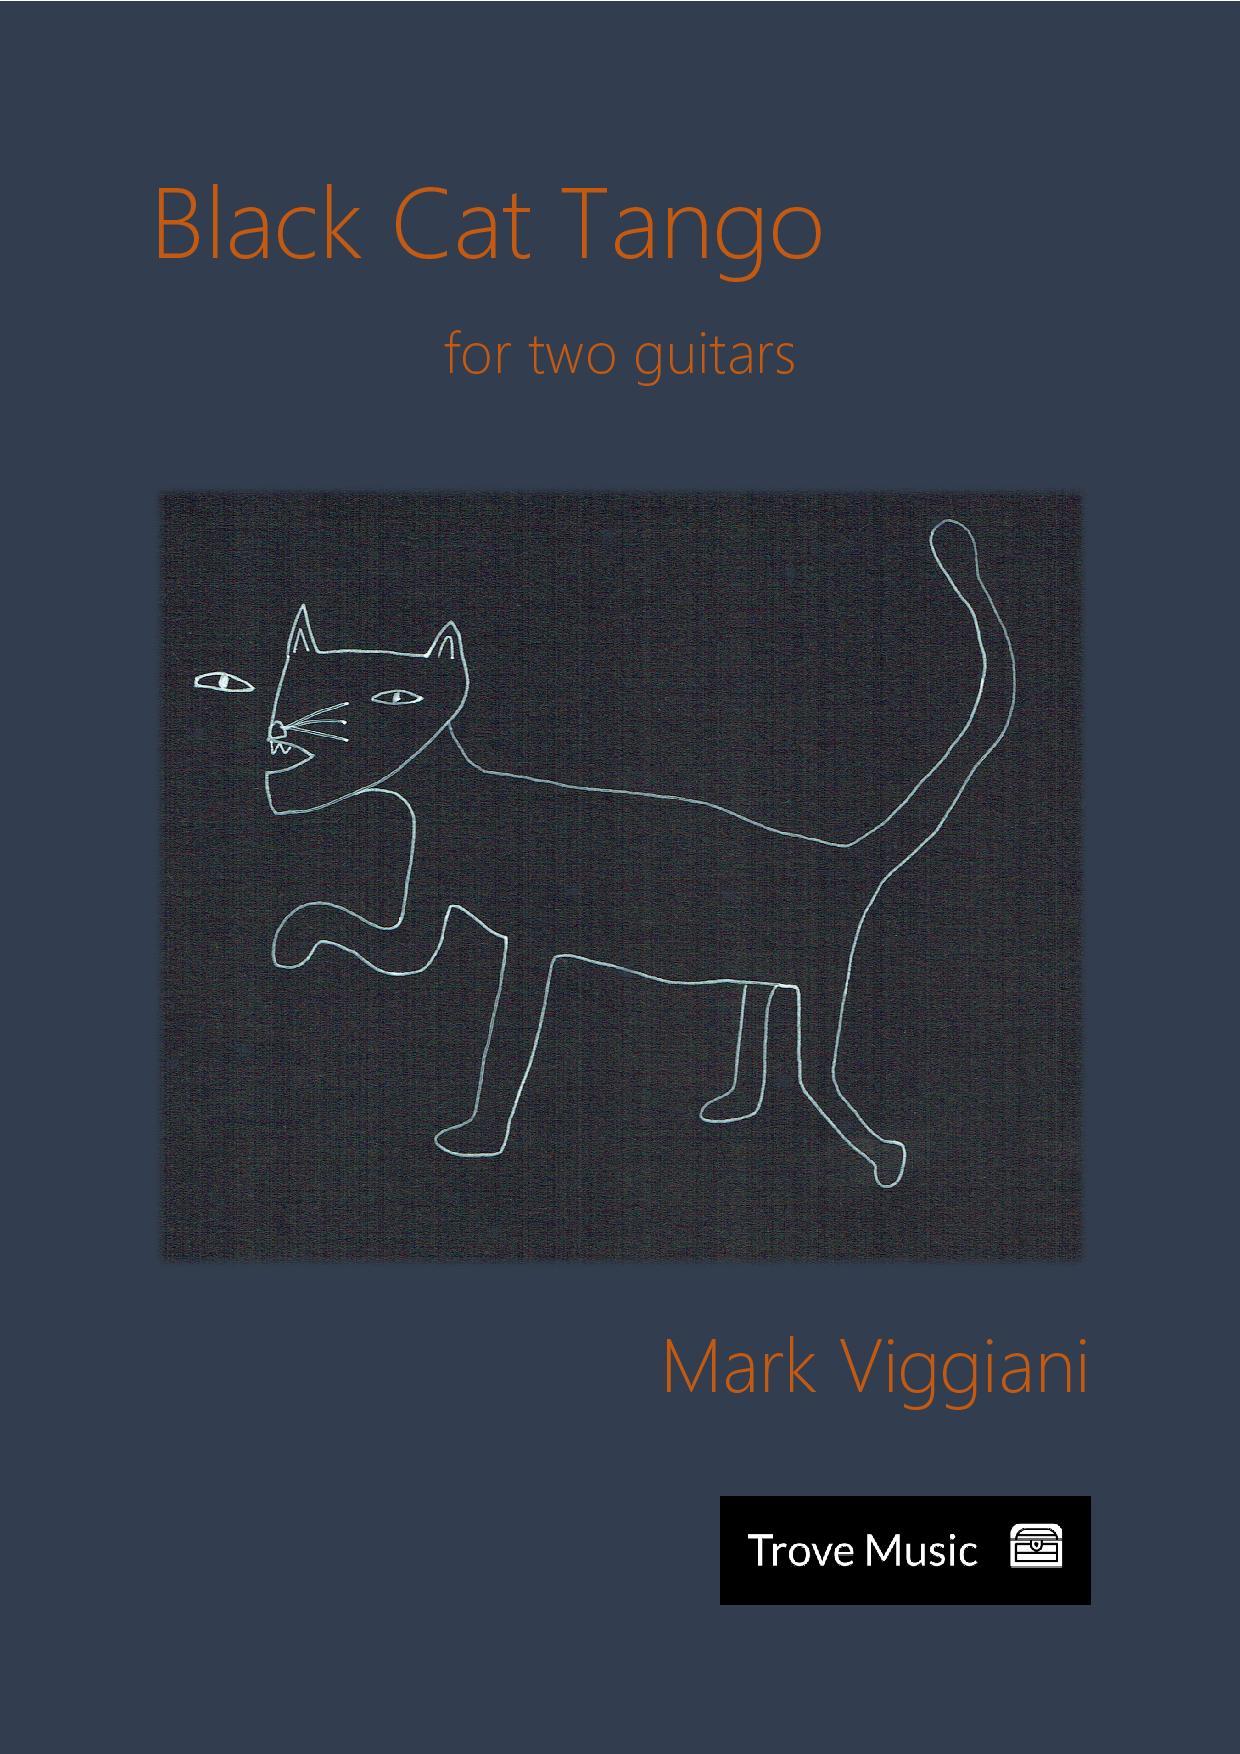 Viggiani Black Cat tango Duet Image.jpg